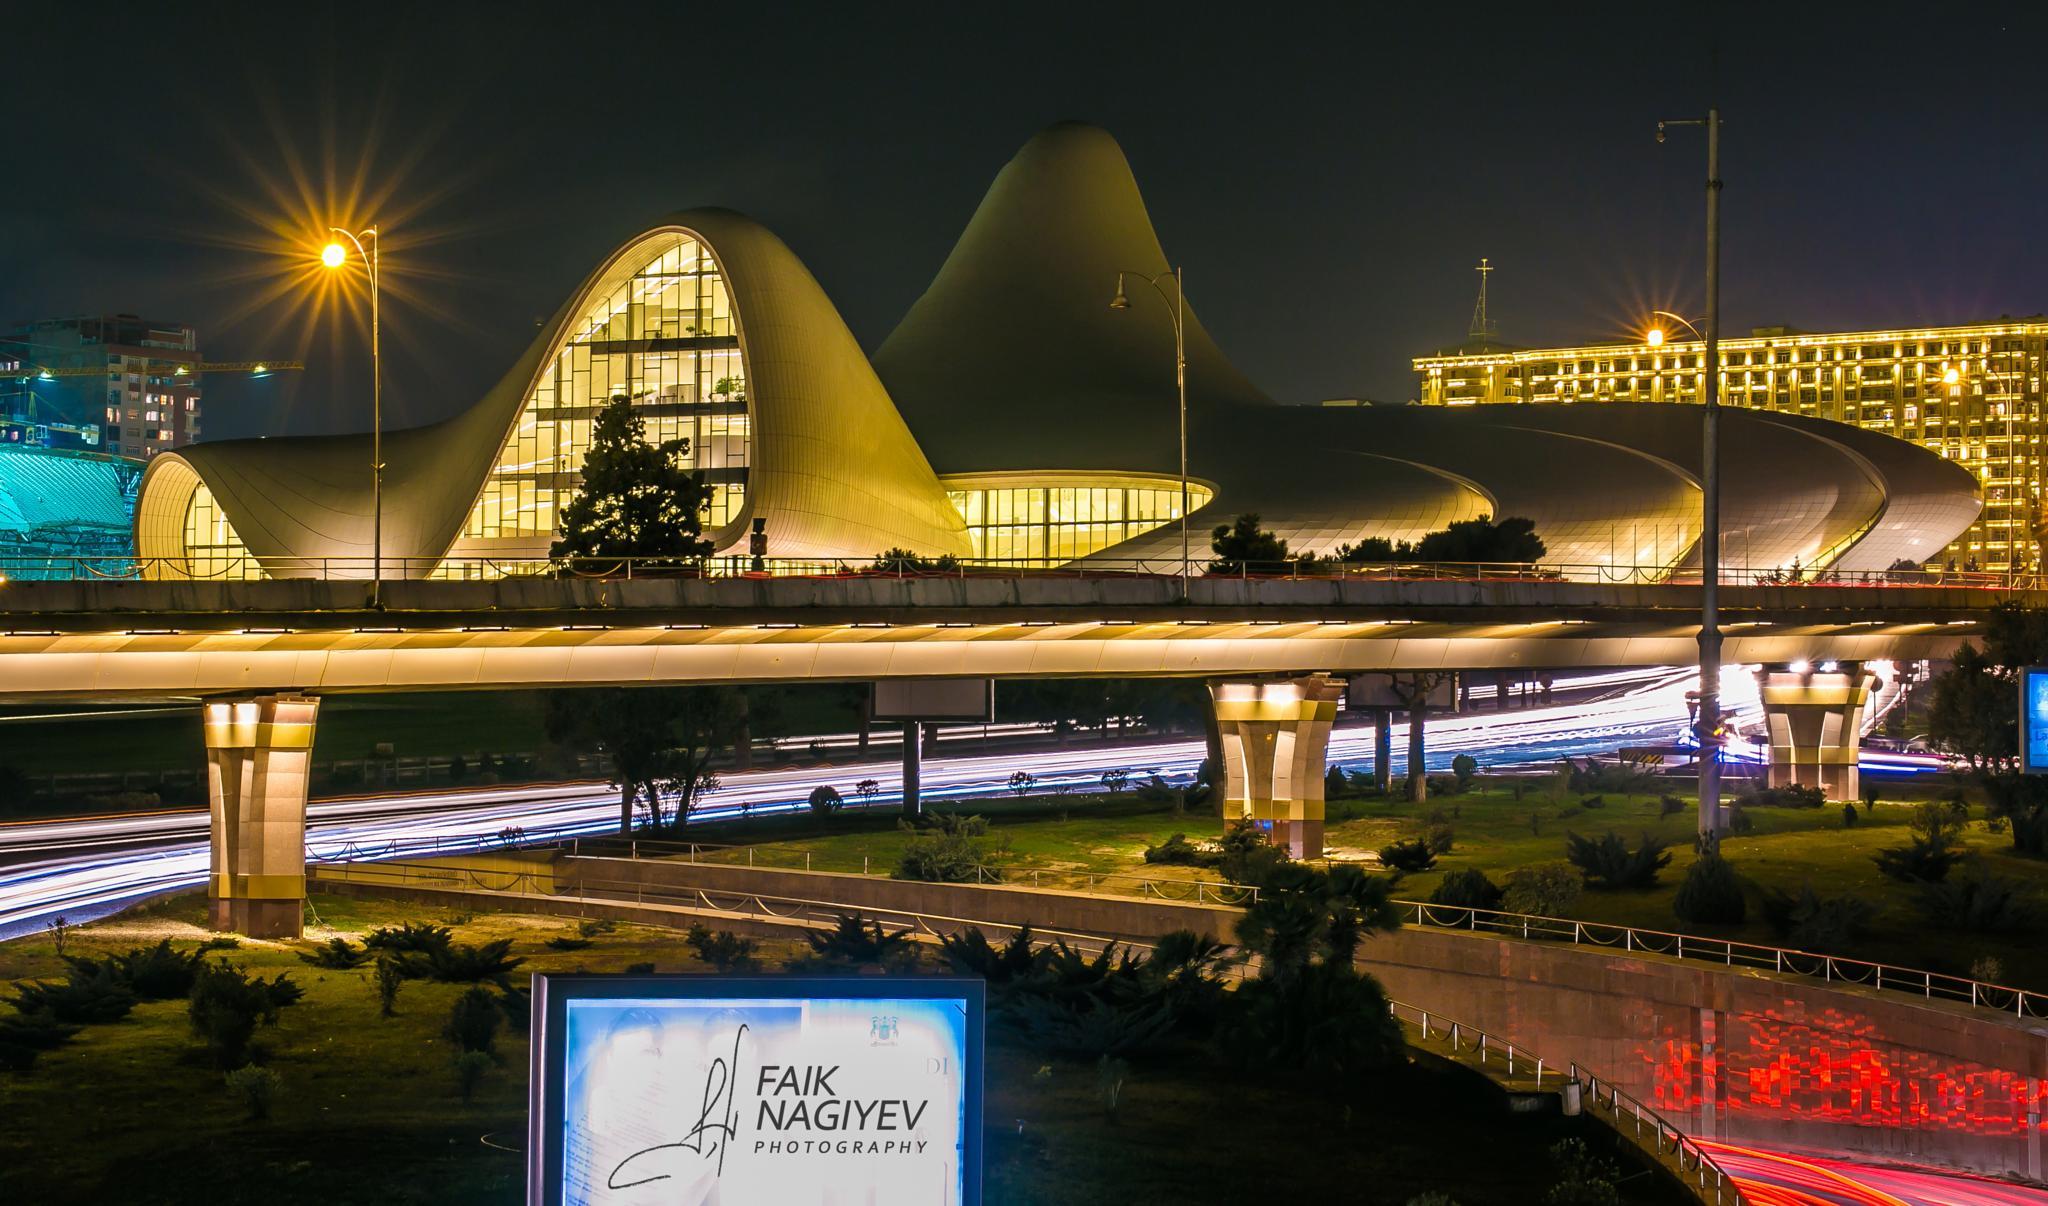 Heydar Aliyev Center by Faik Nagiyev